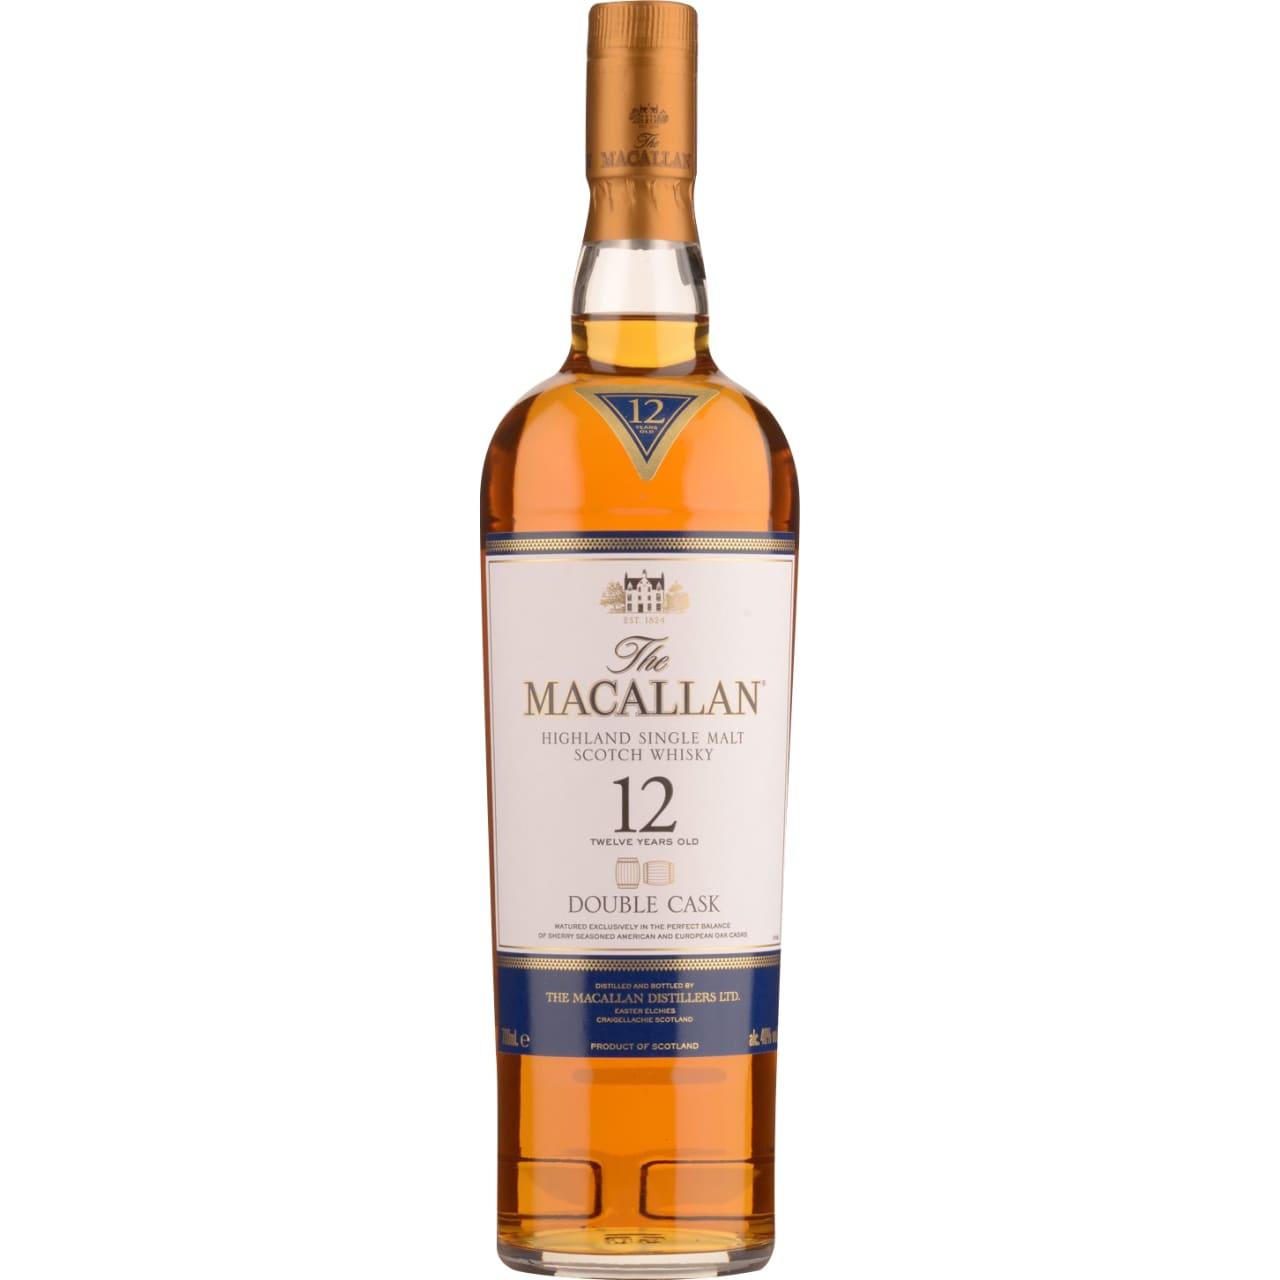 Product Image - The Macallan 12yo Double Cask Single Malt